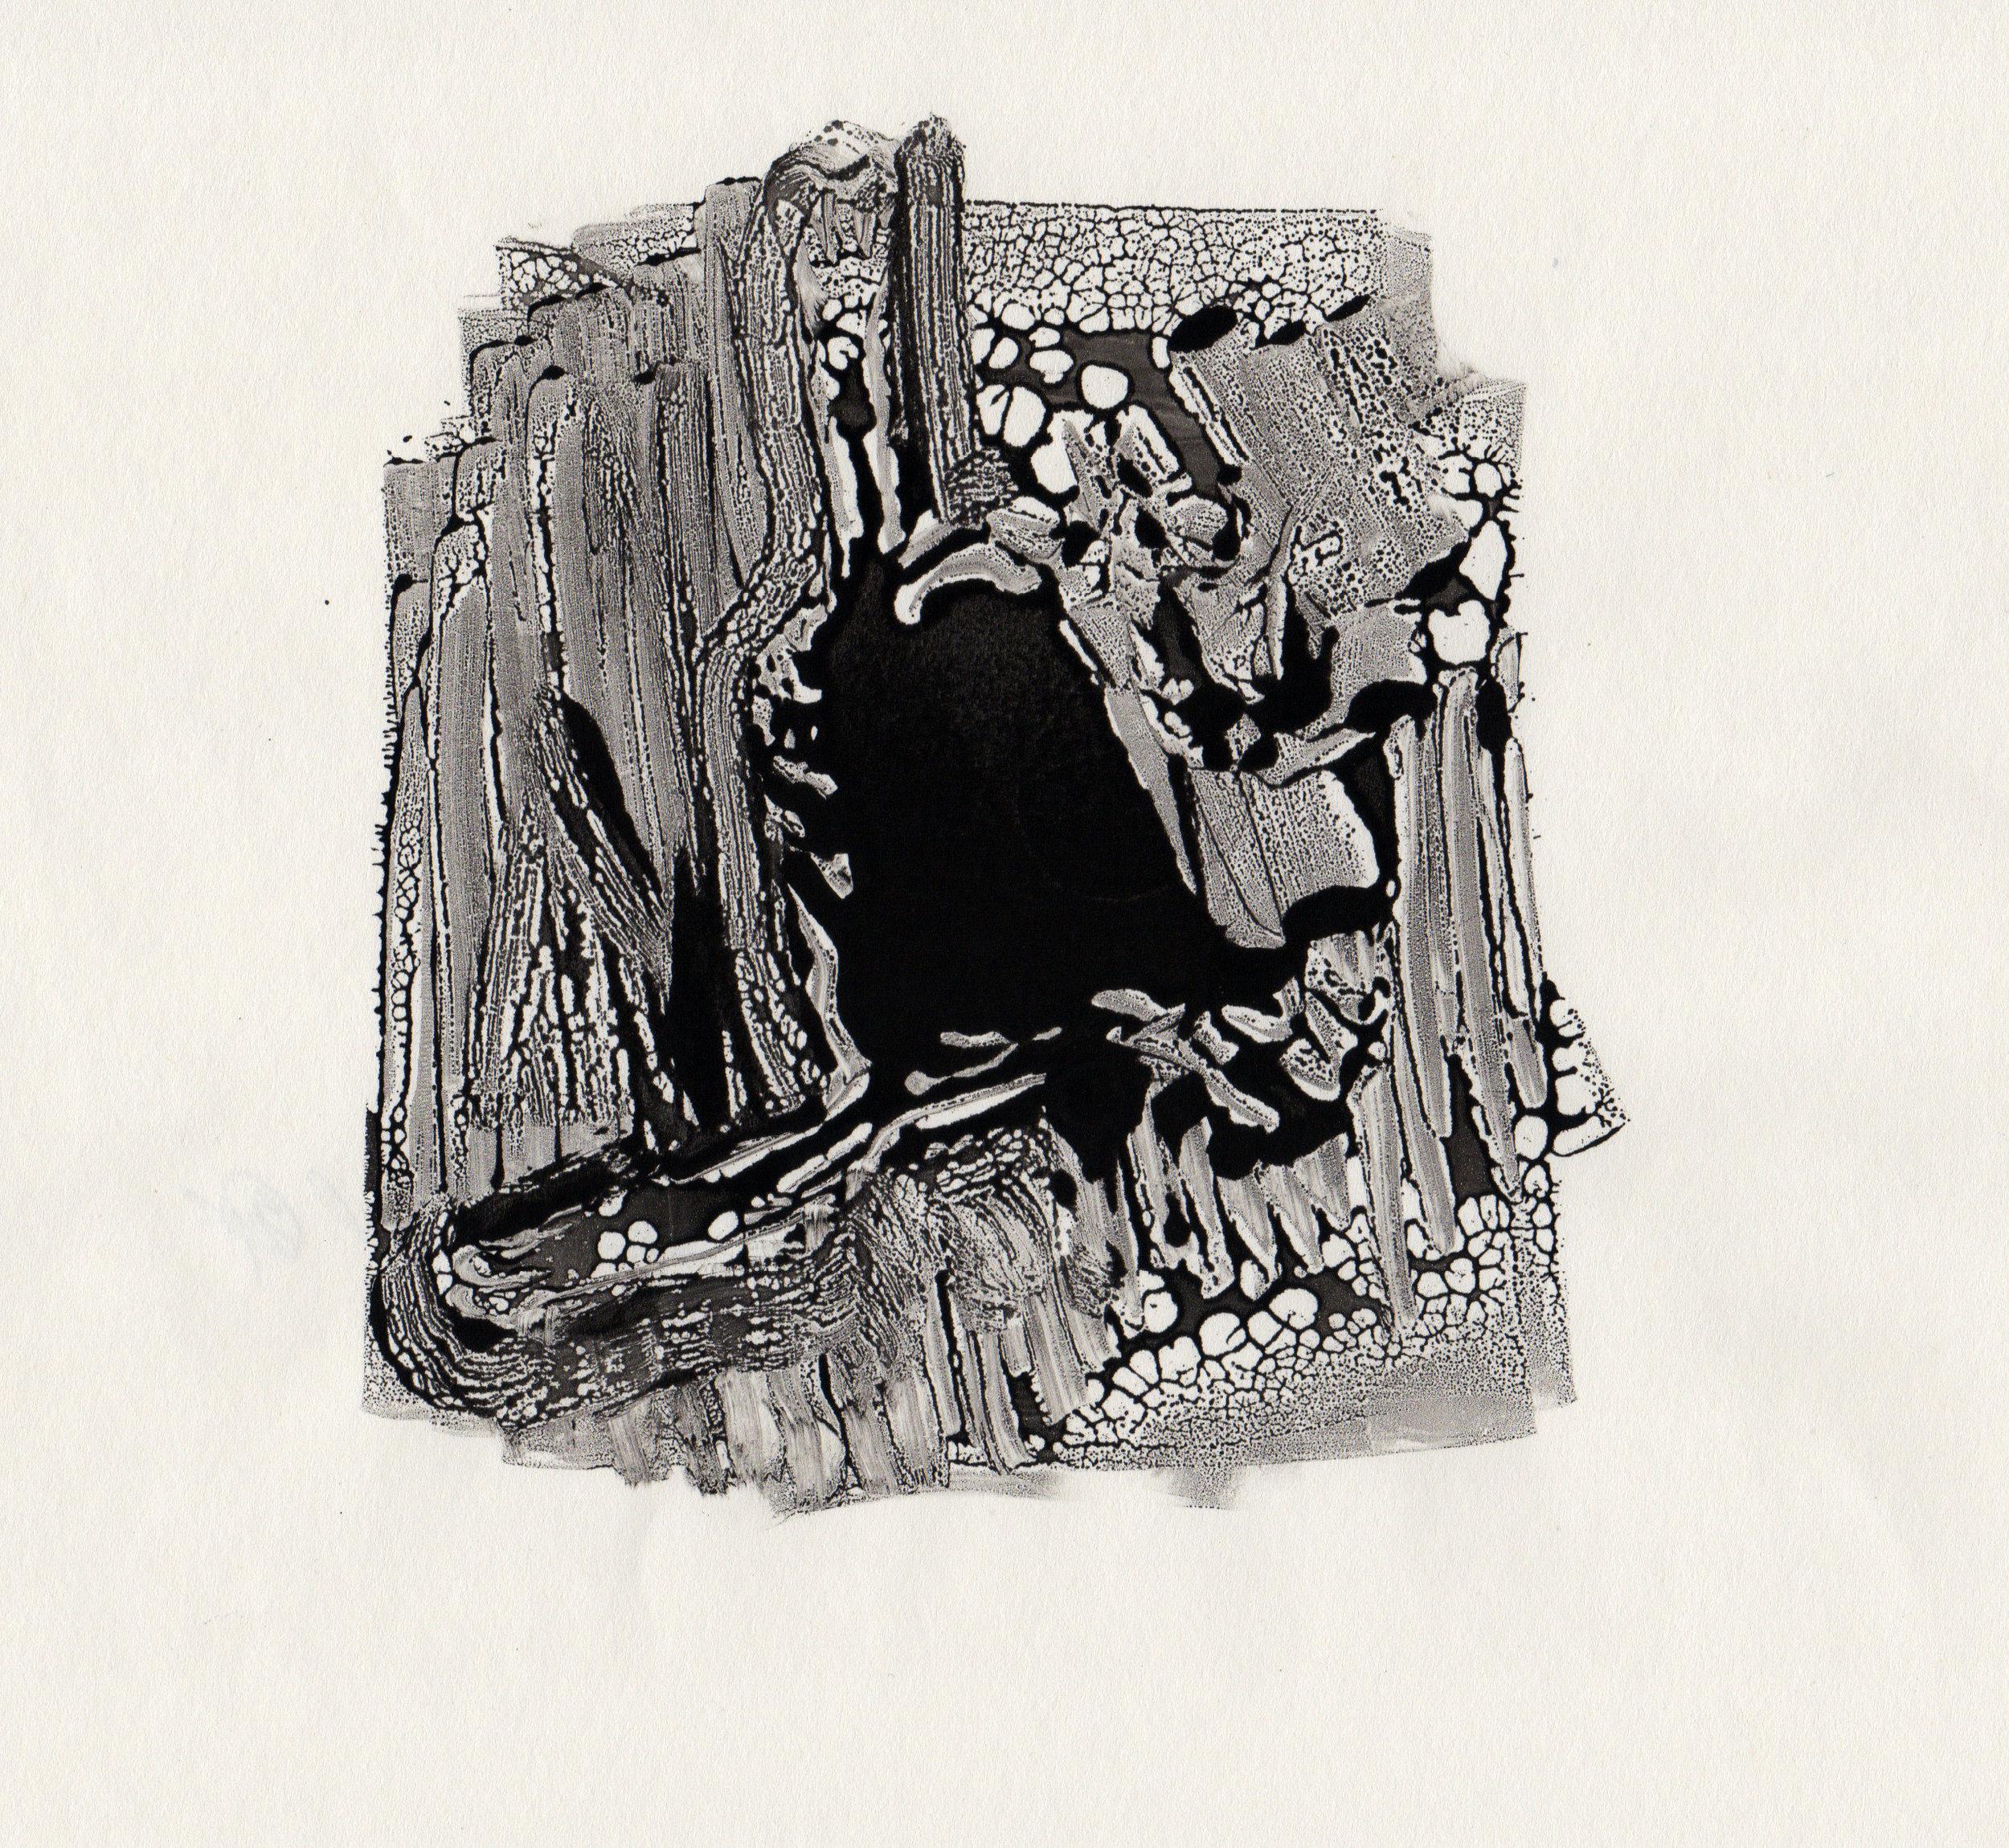 Bell, 2014, gelatin monotype, 10x9 inches